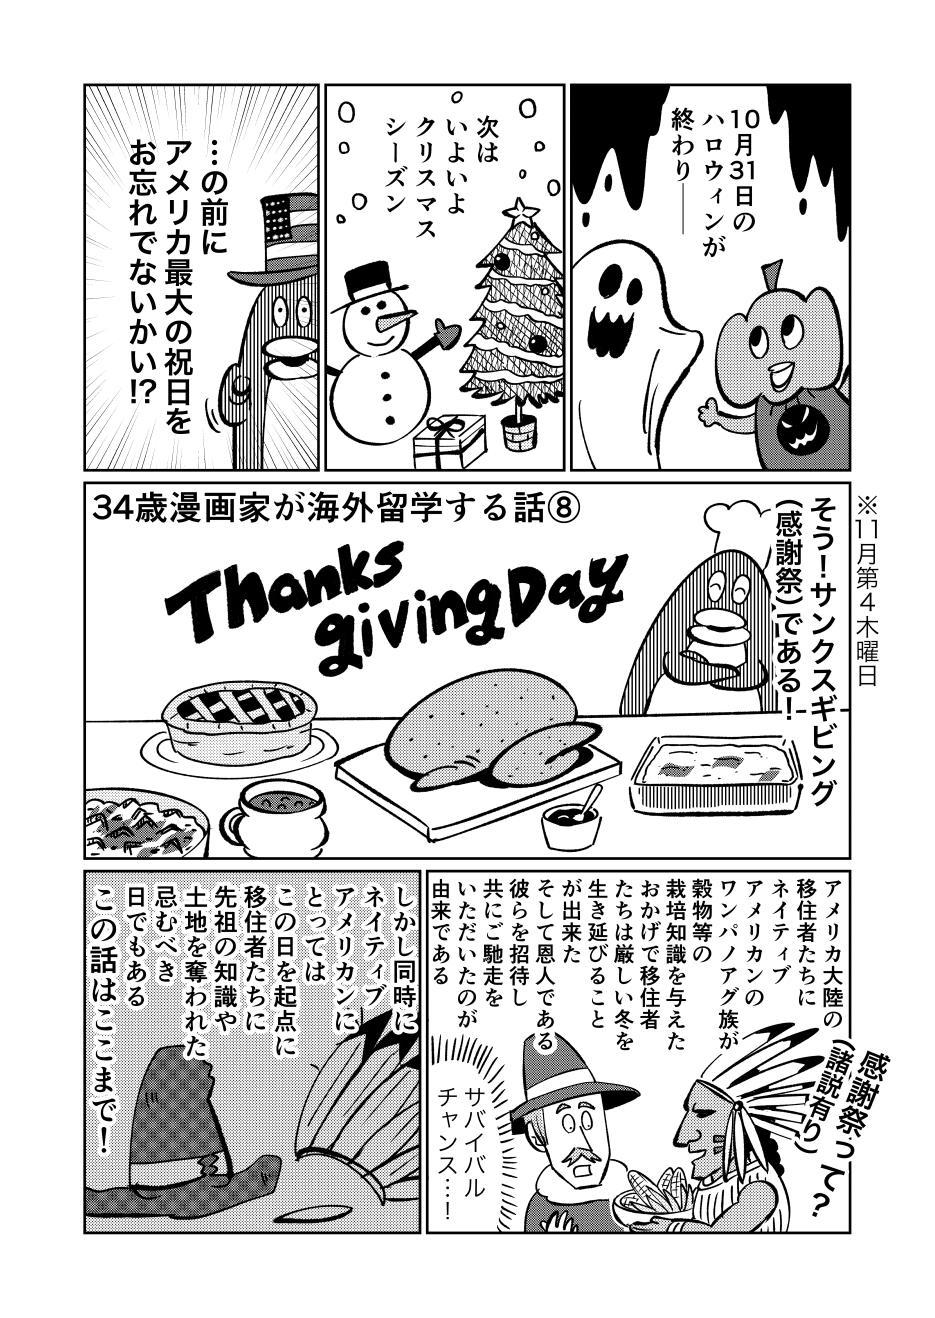 https://www.ryugaku.co.jp/blog/els_portland/upload/418D7322-296C-443C-93A0-BF61196983A5.jpeg